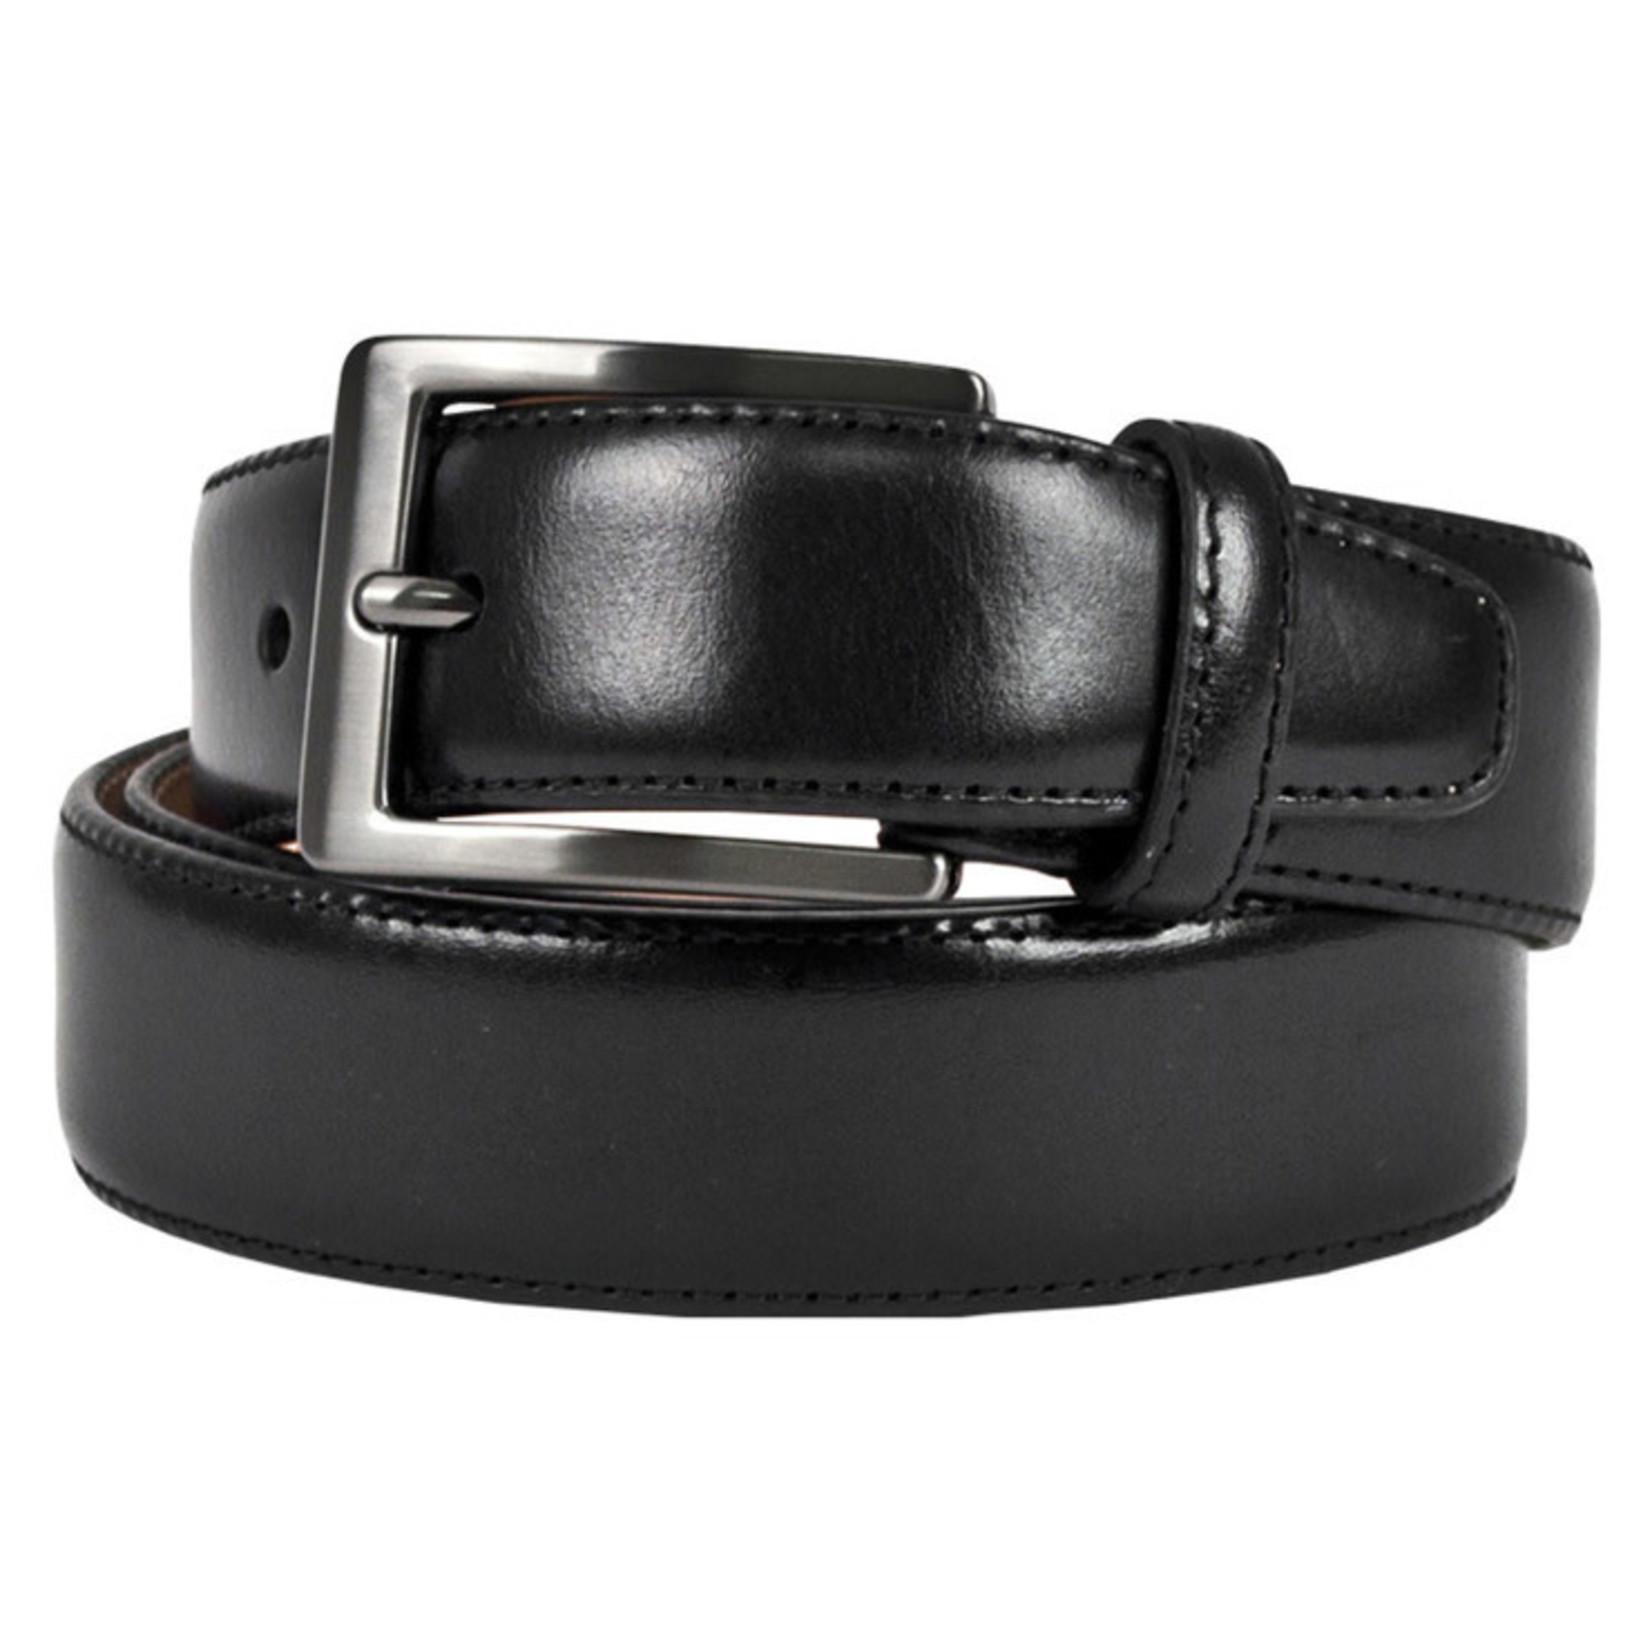 Kirkland Signature Men's Reversible Leather Belt (Black/Brown) Size 34